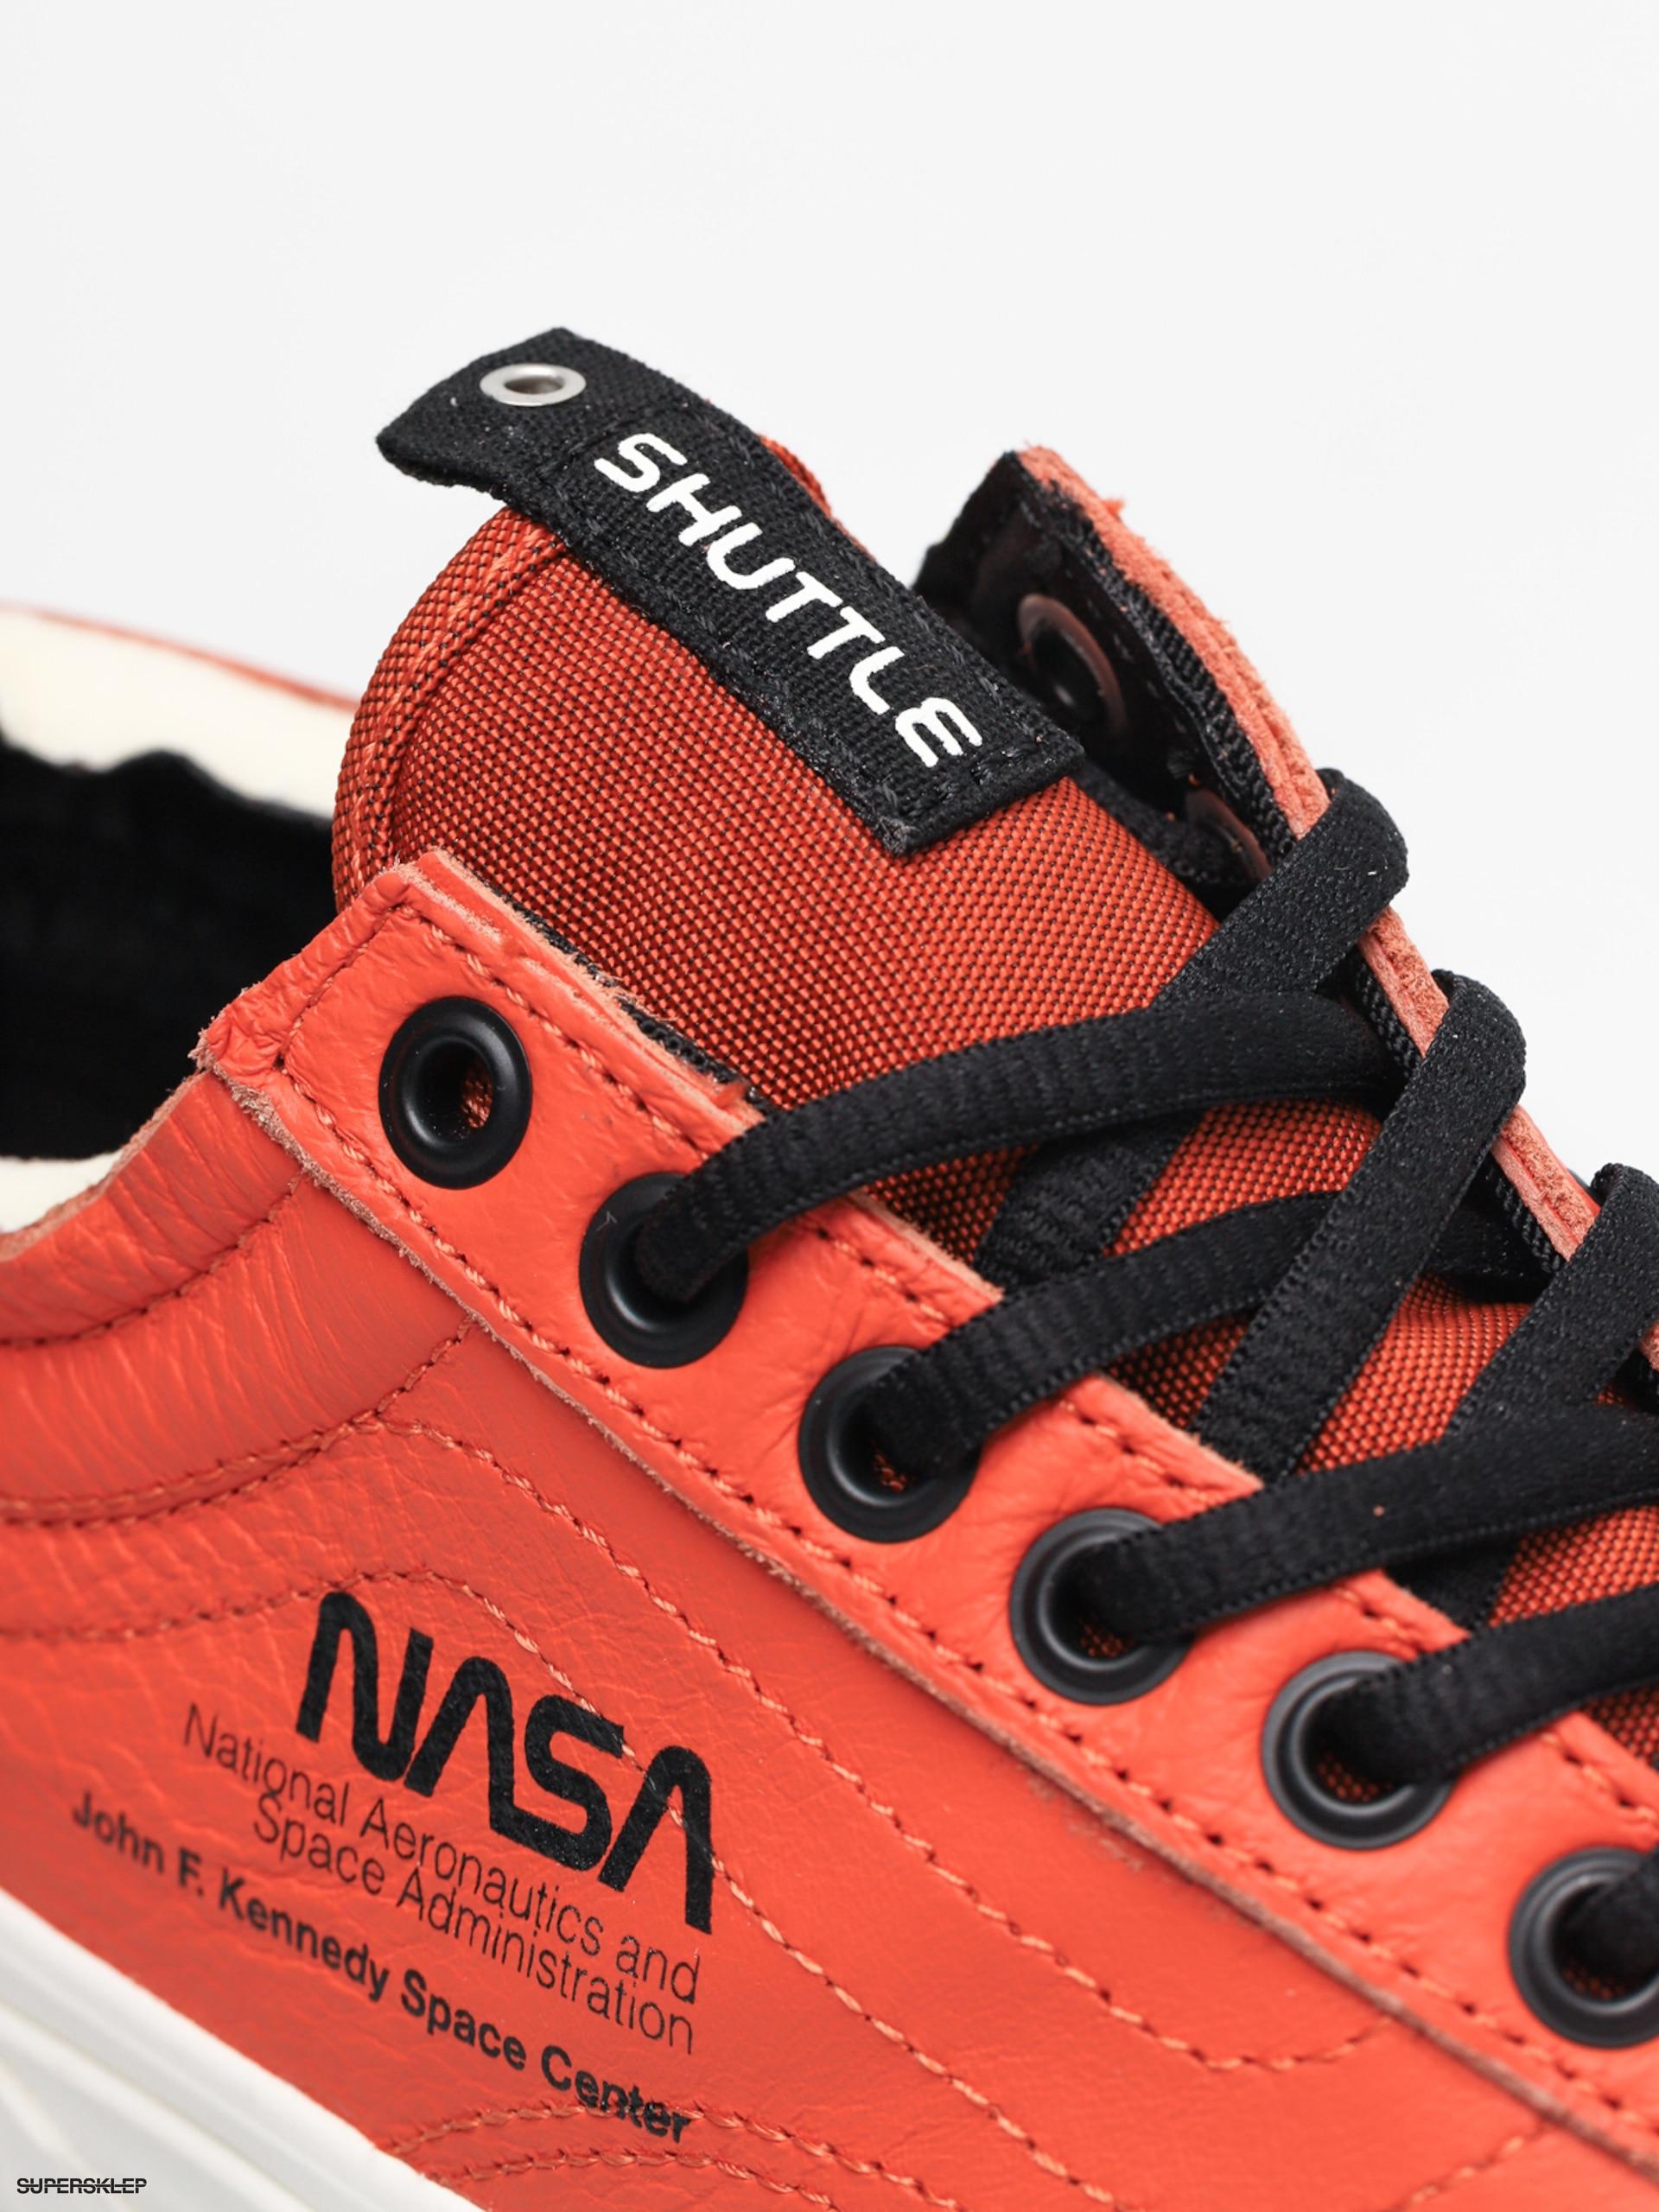 ae3d7e49225ba Buty Vans x NASA Old Skool Space Voyager (nasa firecracker)